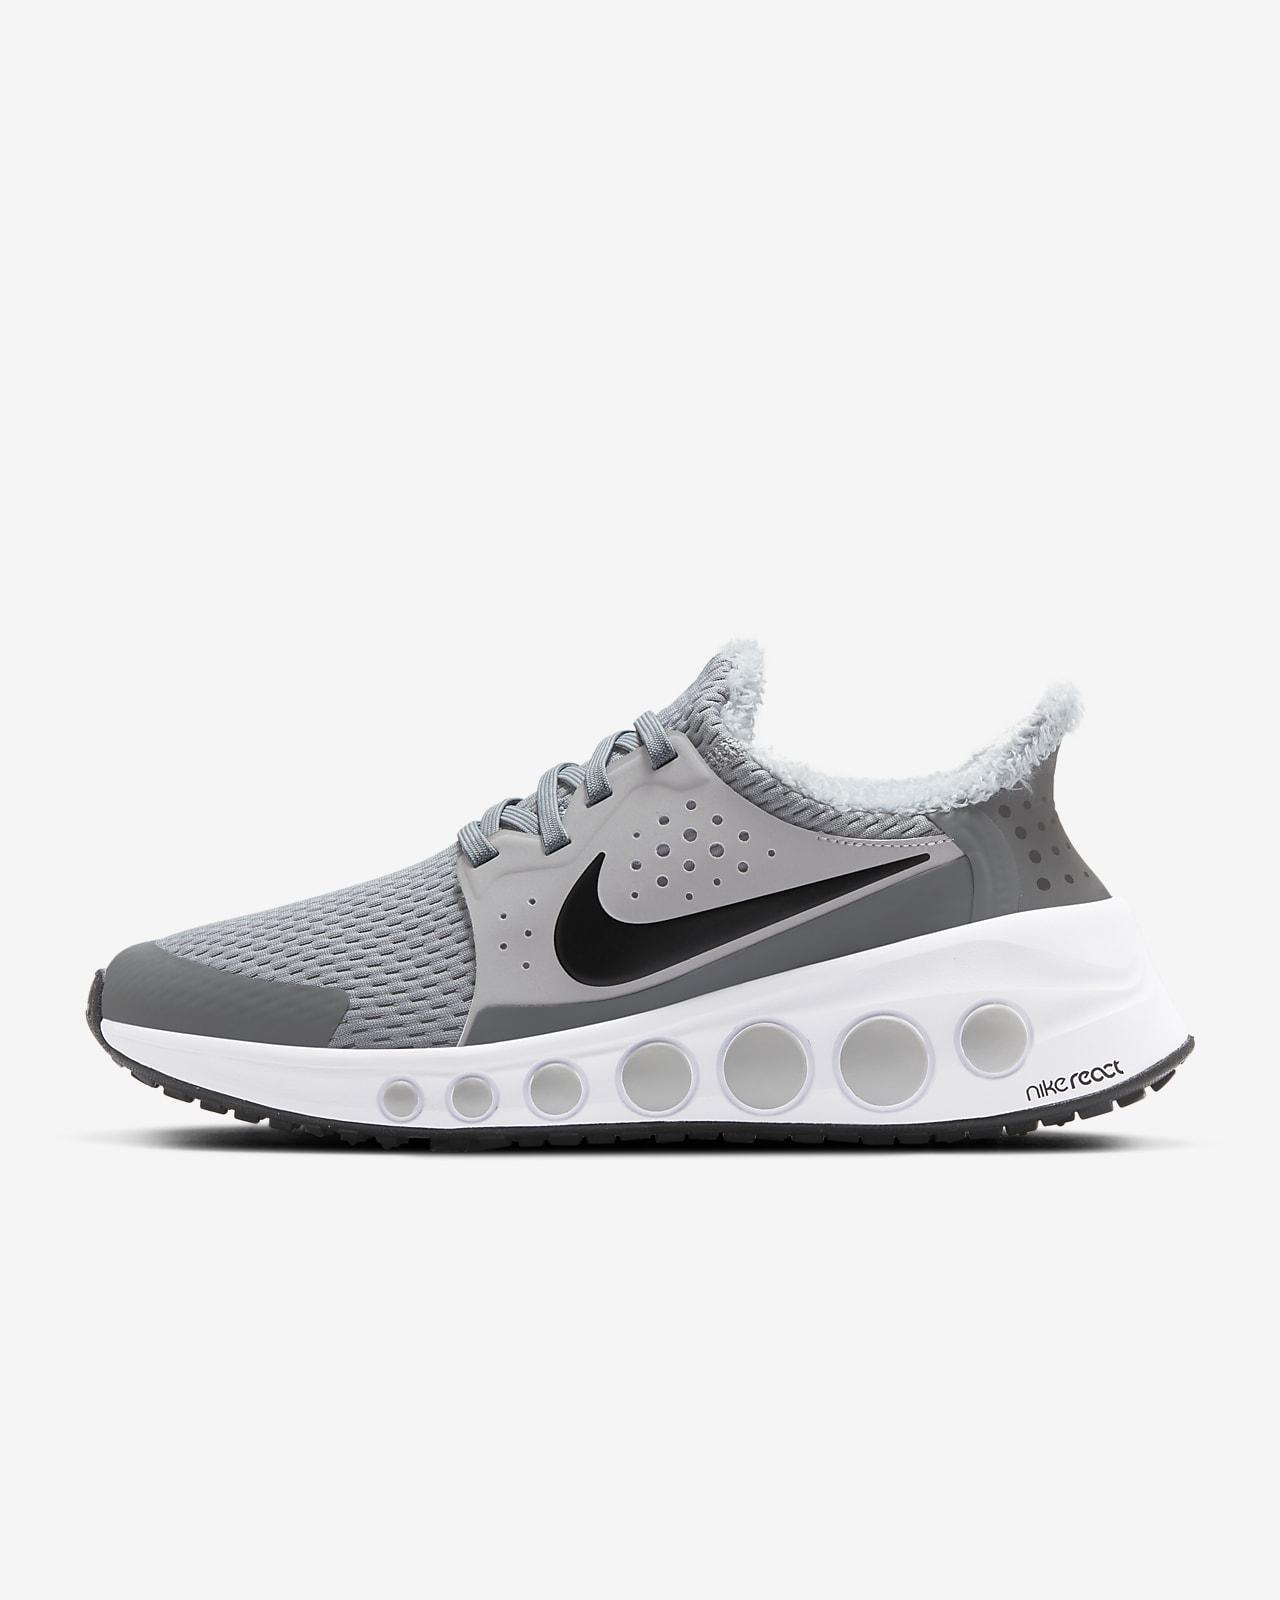 Chaussure mixte Nike CruzrOne